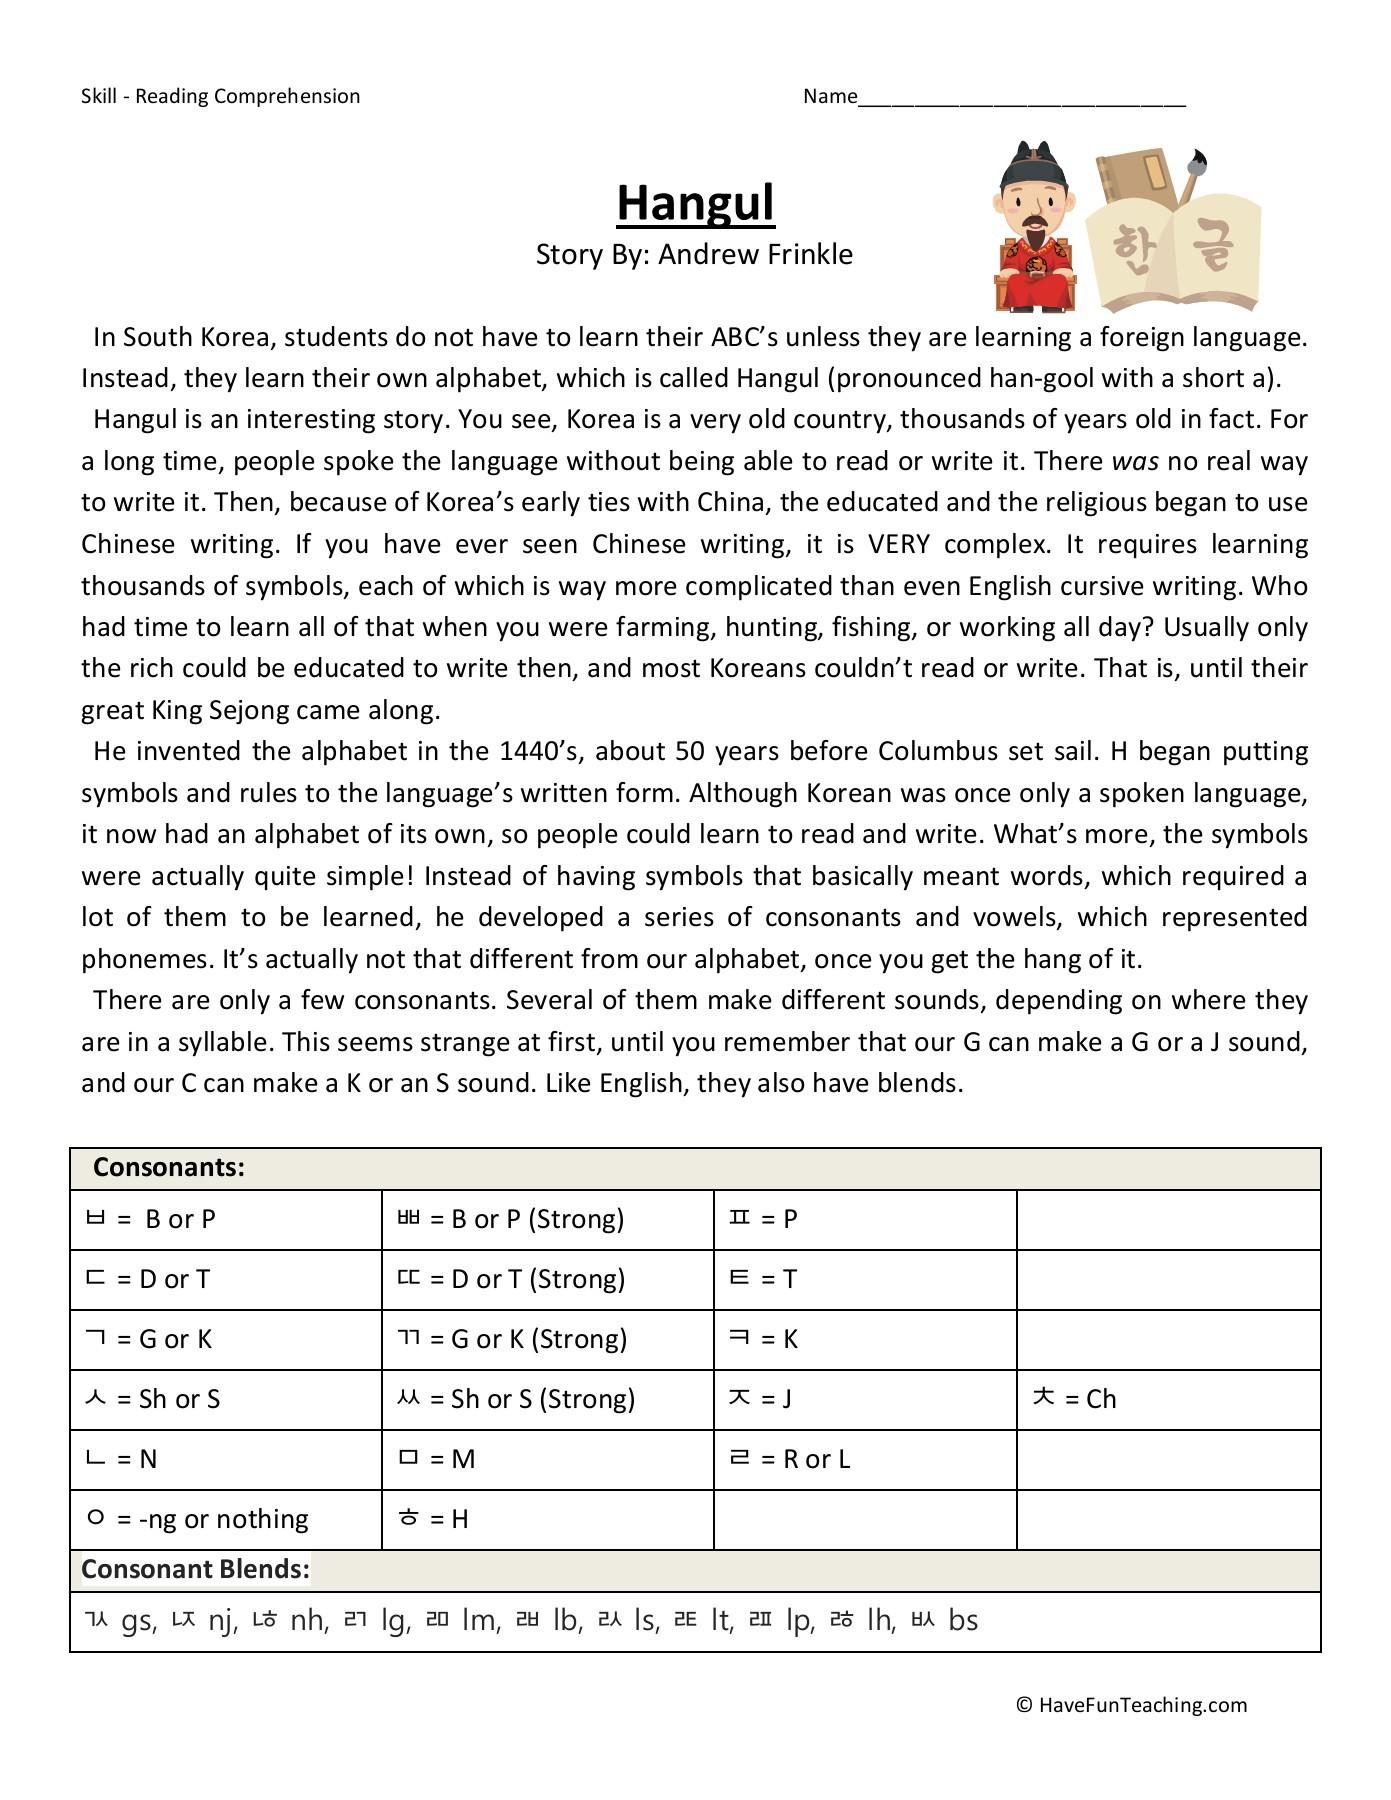 hight resolution of hangul-sixth-grade-reading-comprehension-worksheet Pages 1 - 5 - Flip PDF  Download   FlipHTML5